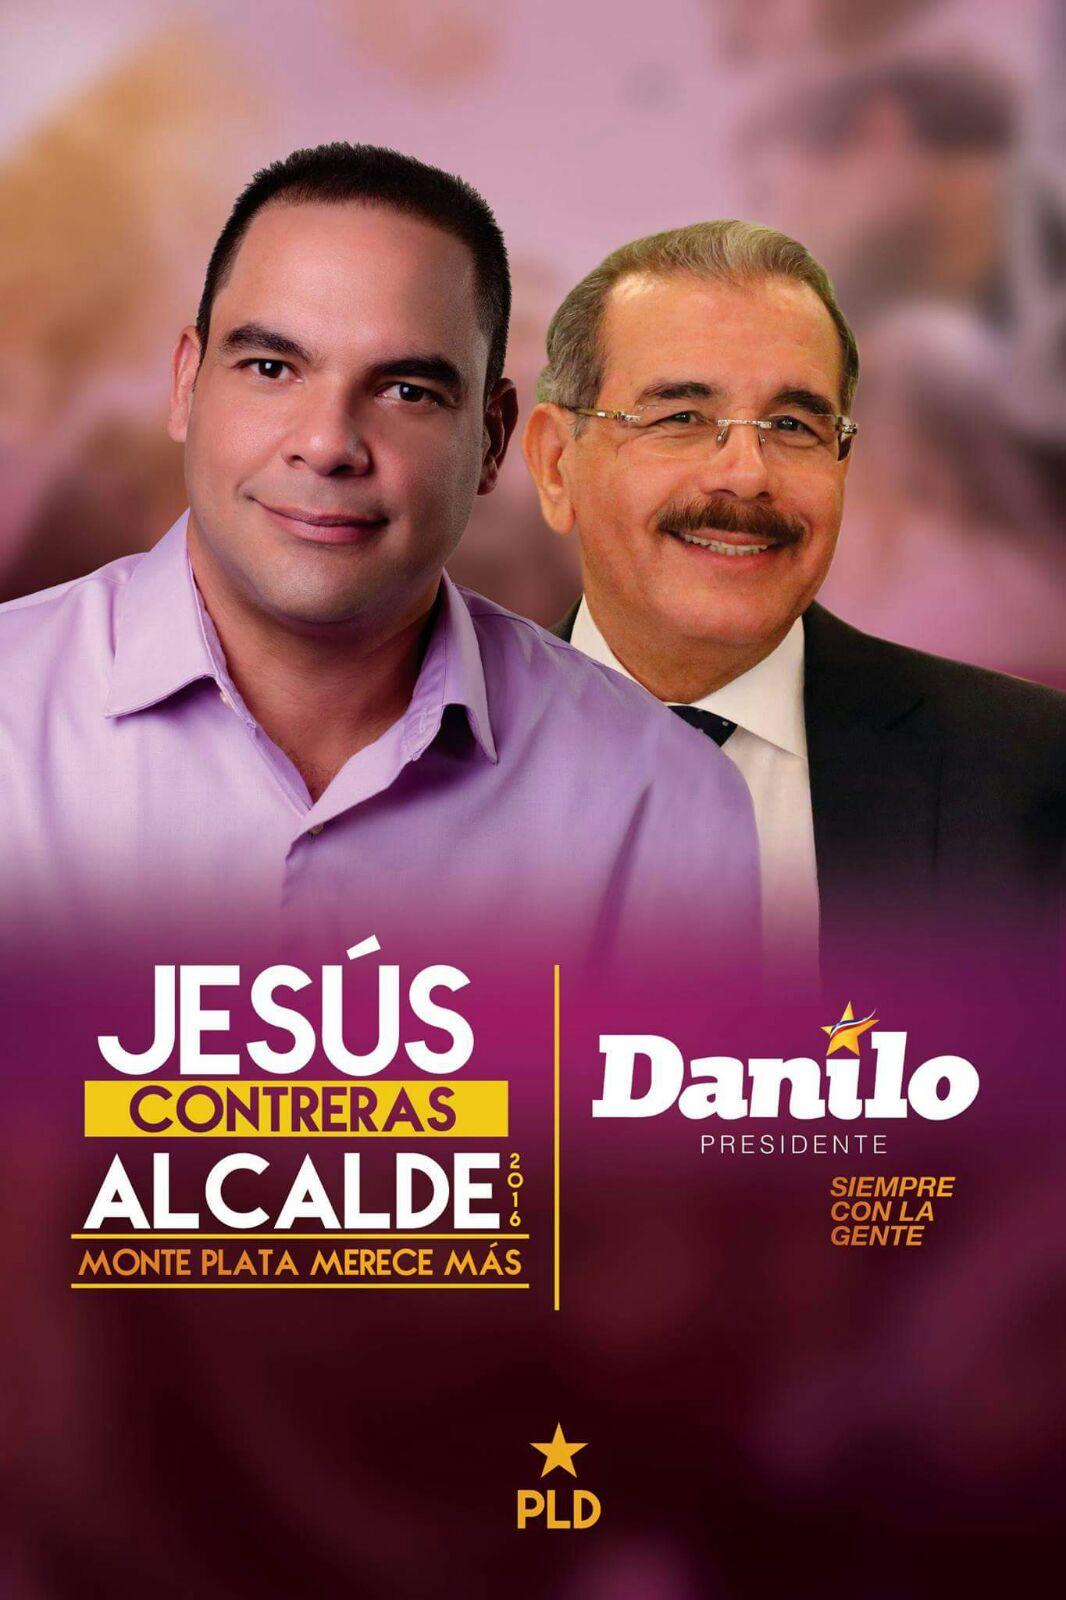 Jesús Contreras 2016 - 2020 PLD